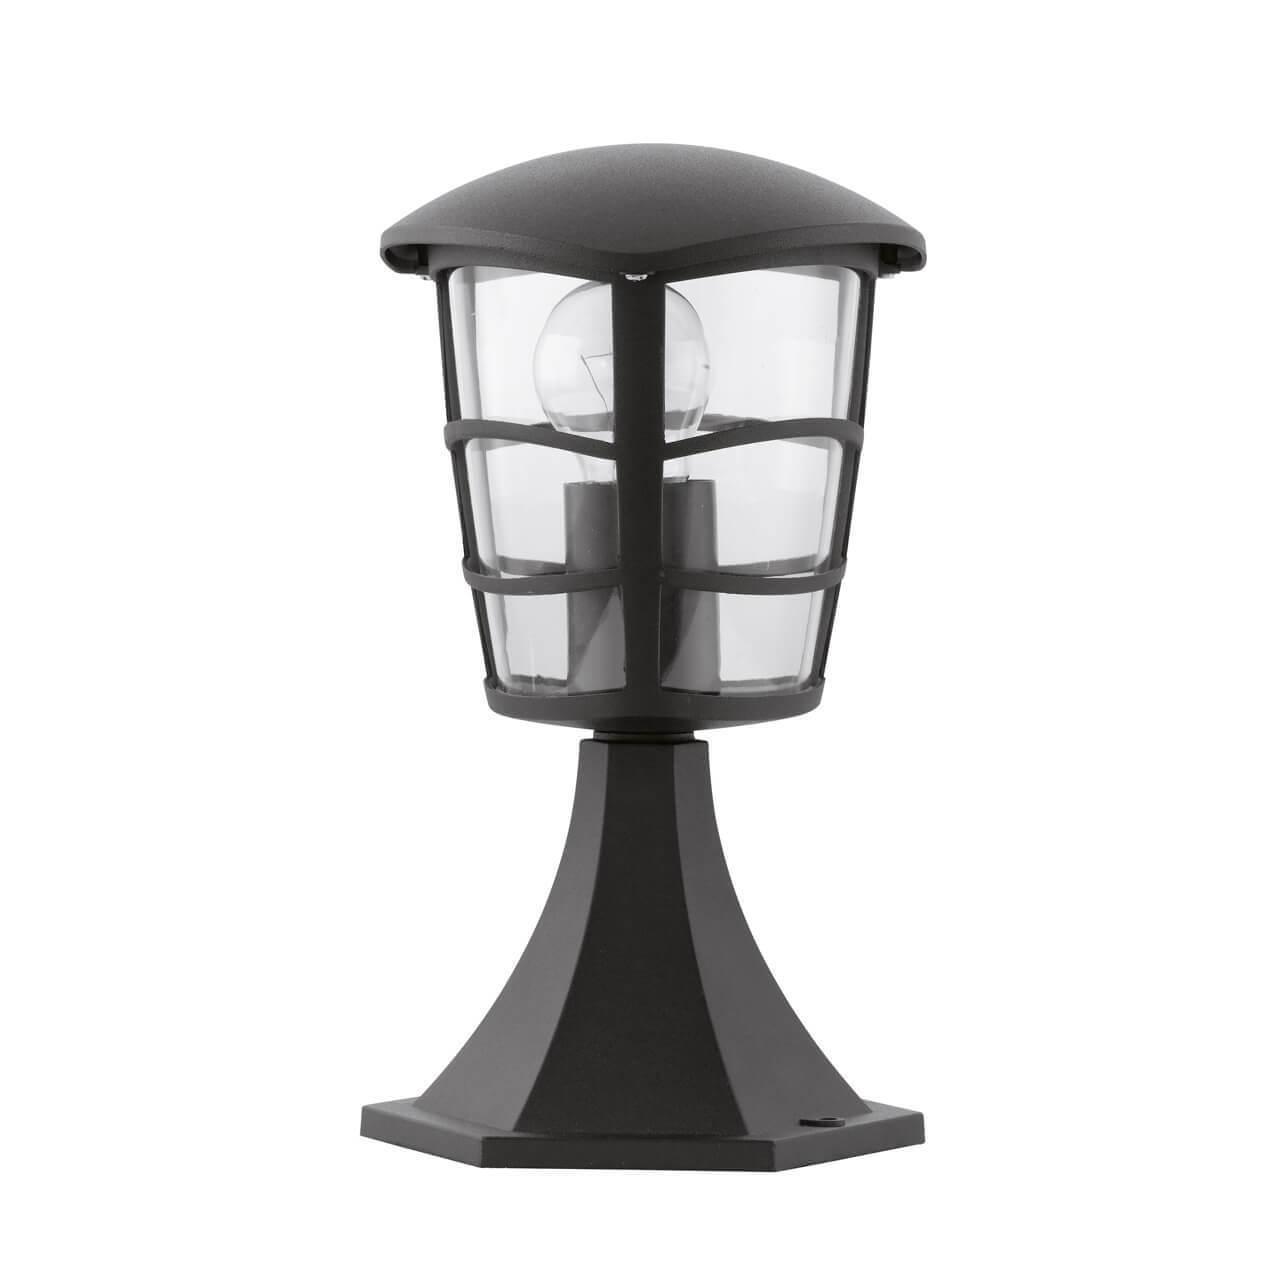 цена на Уличный светильник Eglo 93099, E27